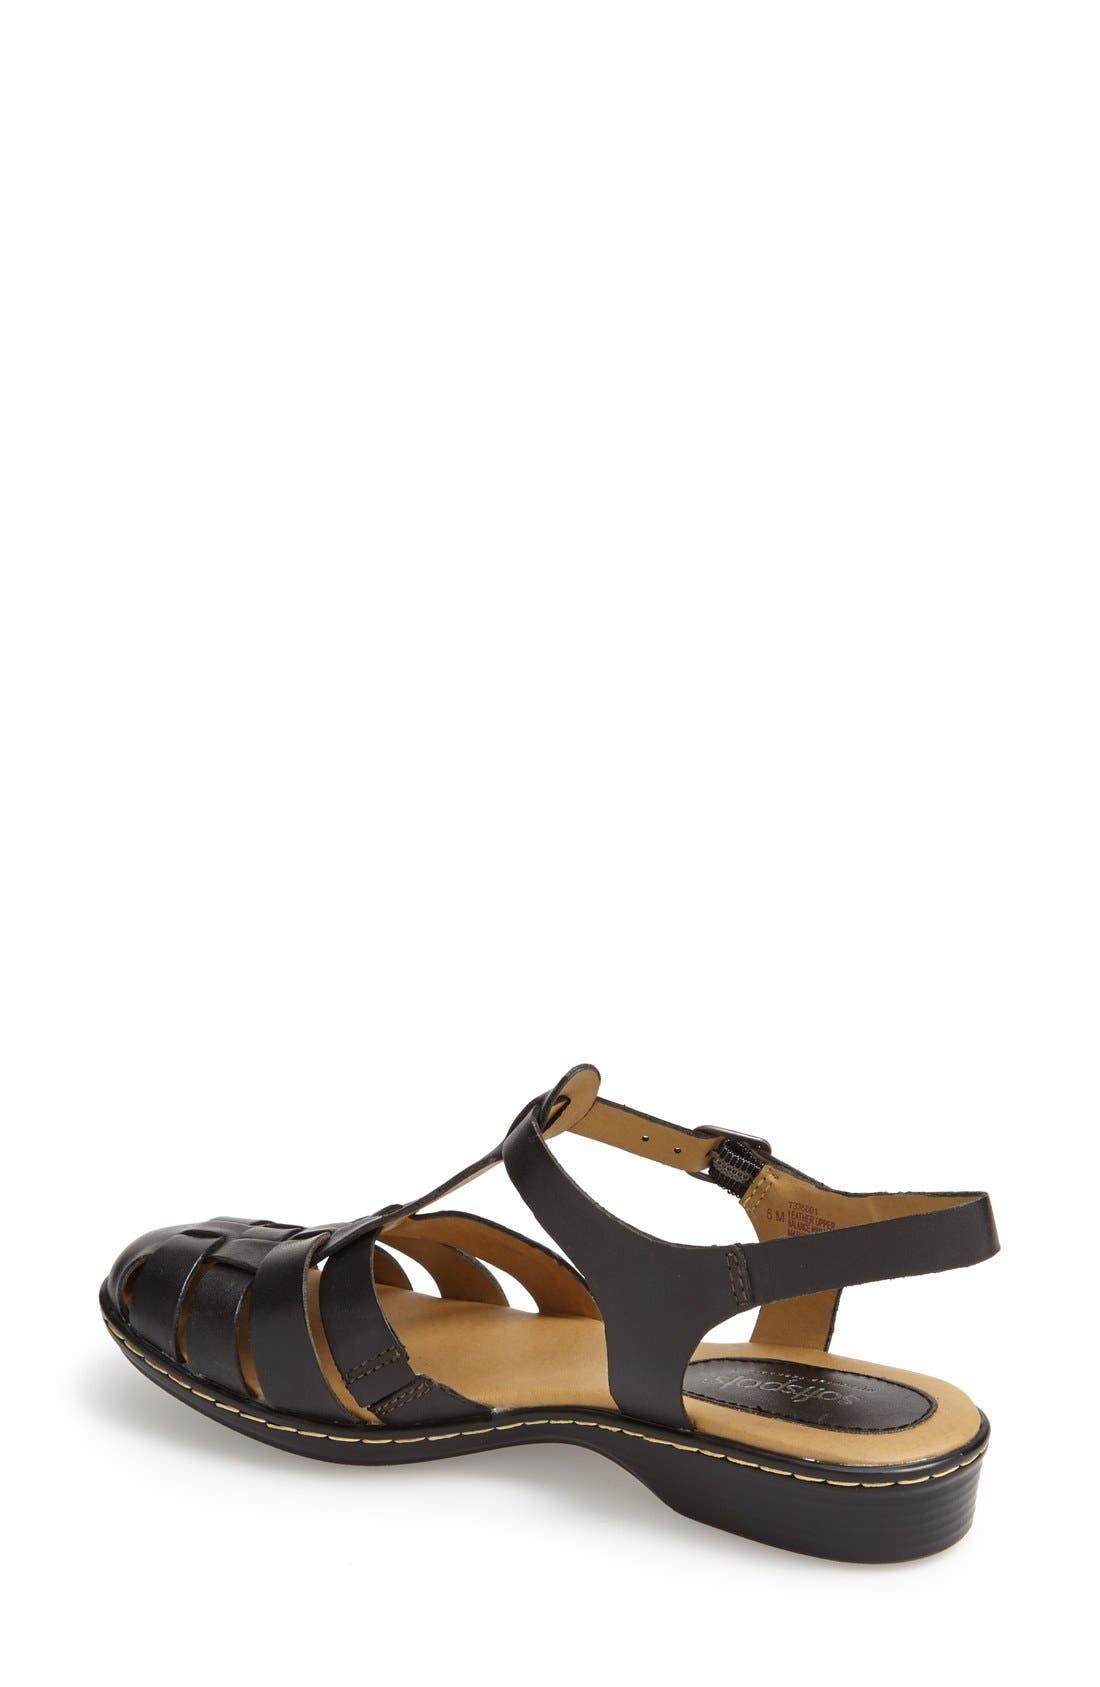 Alternate Image 2  - Softspots 'Holly' Leather T-Strap Huarache Sandal (Women)